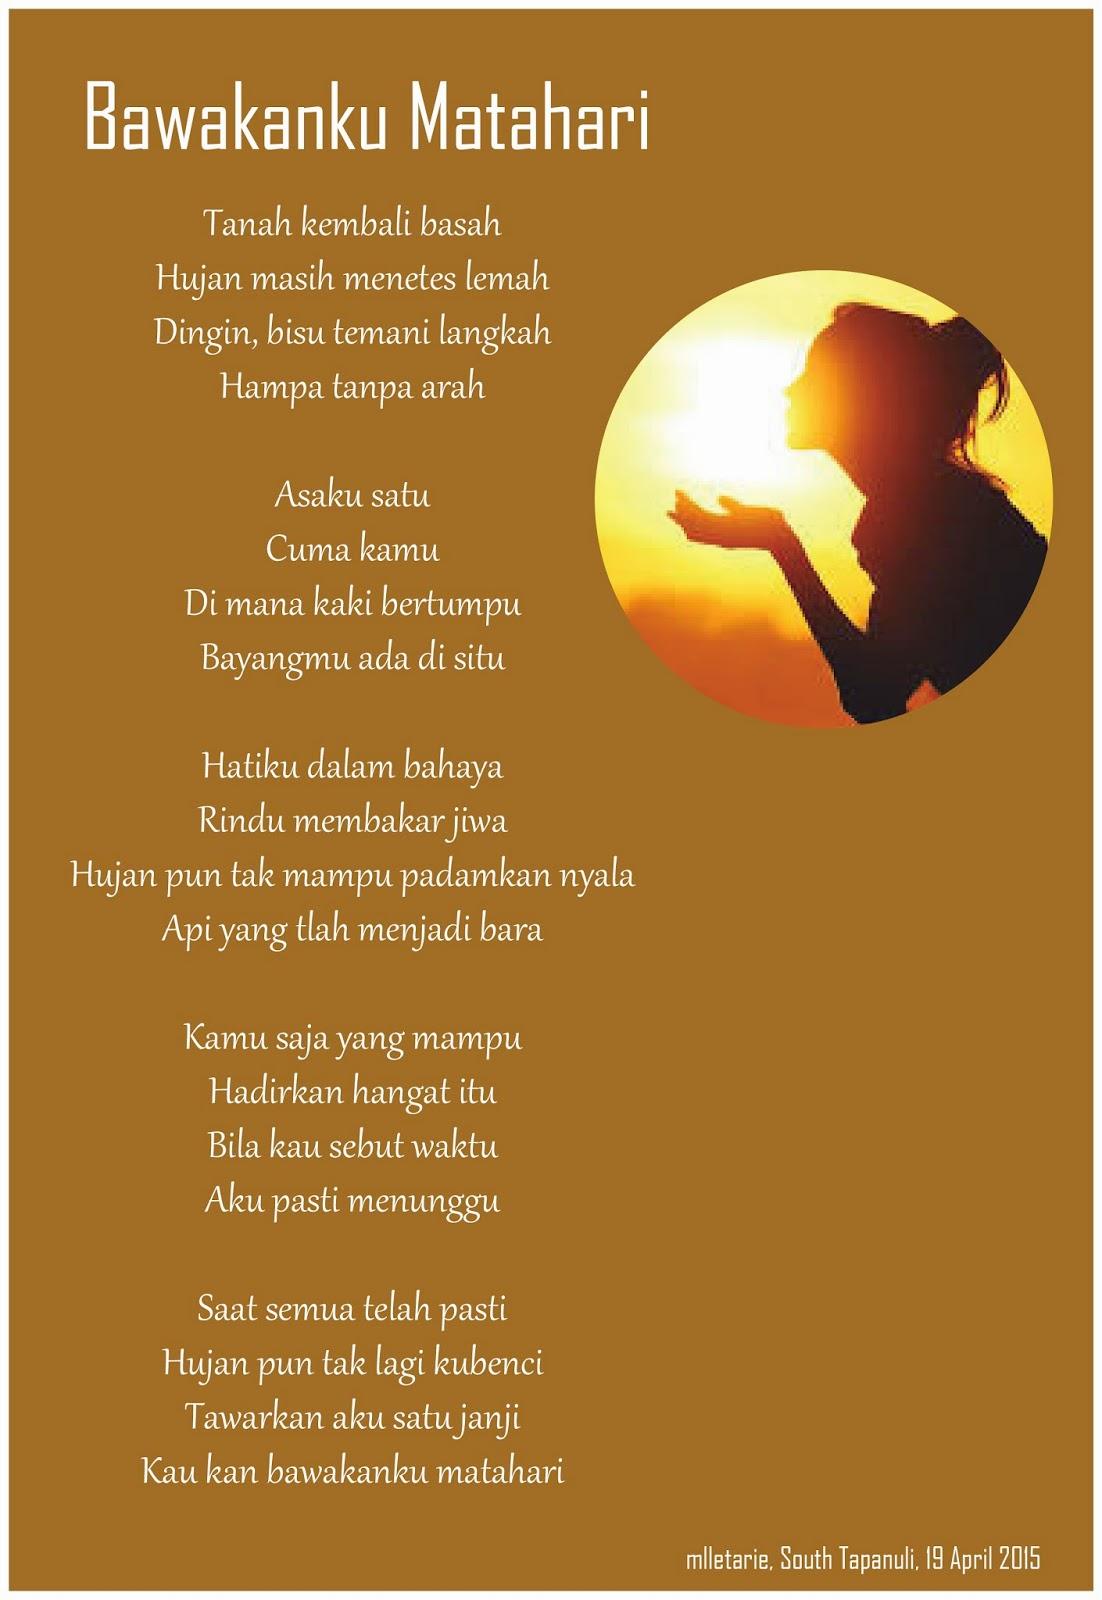 Puisi Matahari Pagi